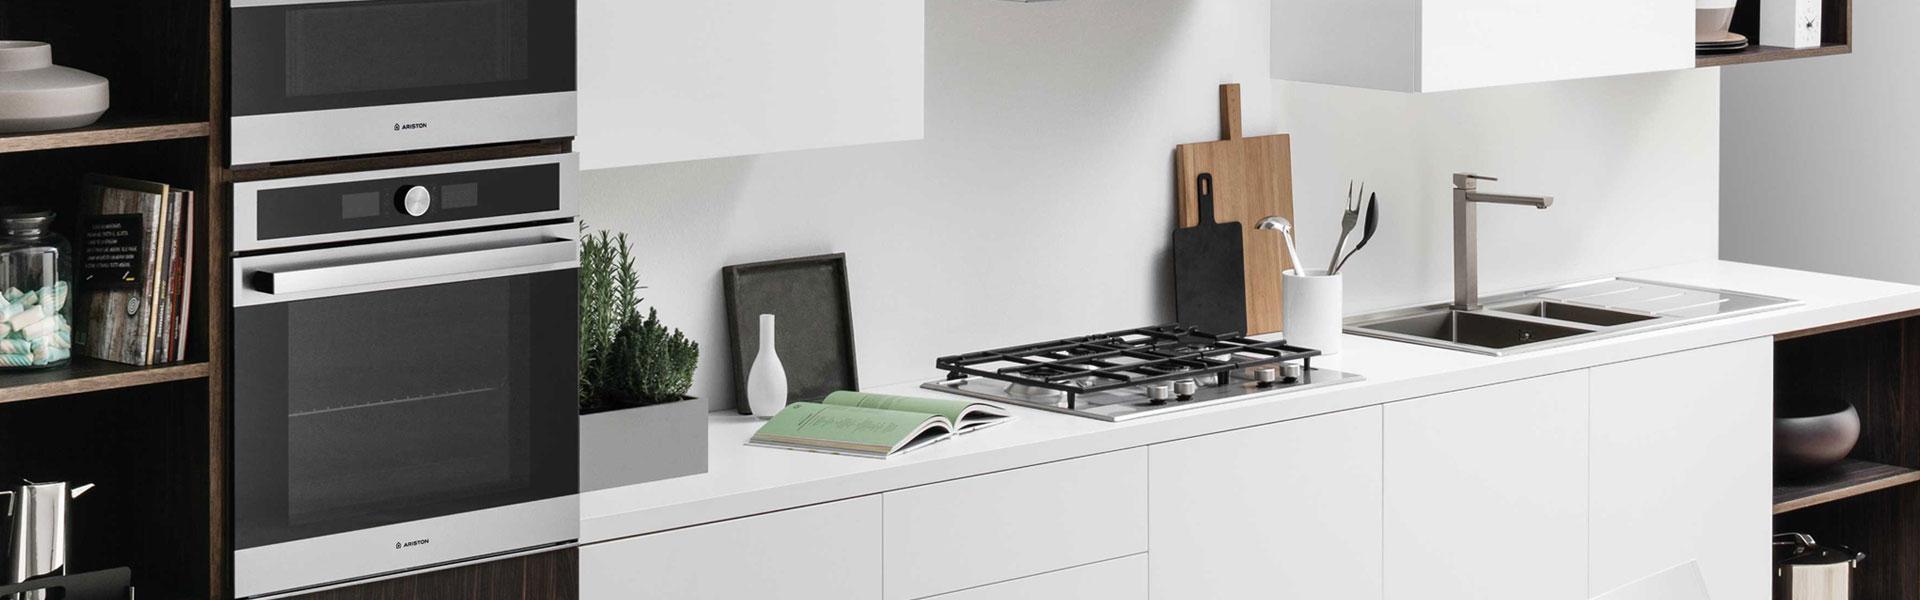 Modern Hk Kitchen Image - Kitchen Cabinets   Ideas & Inspiration ...